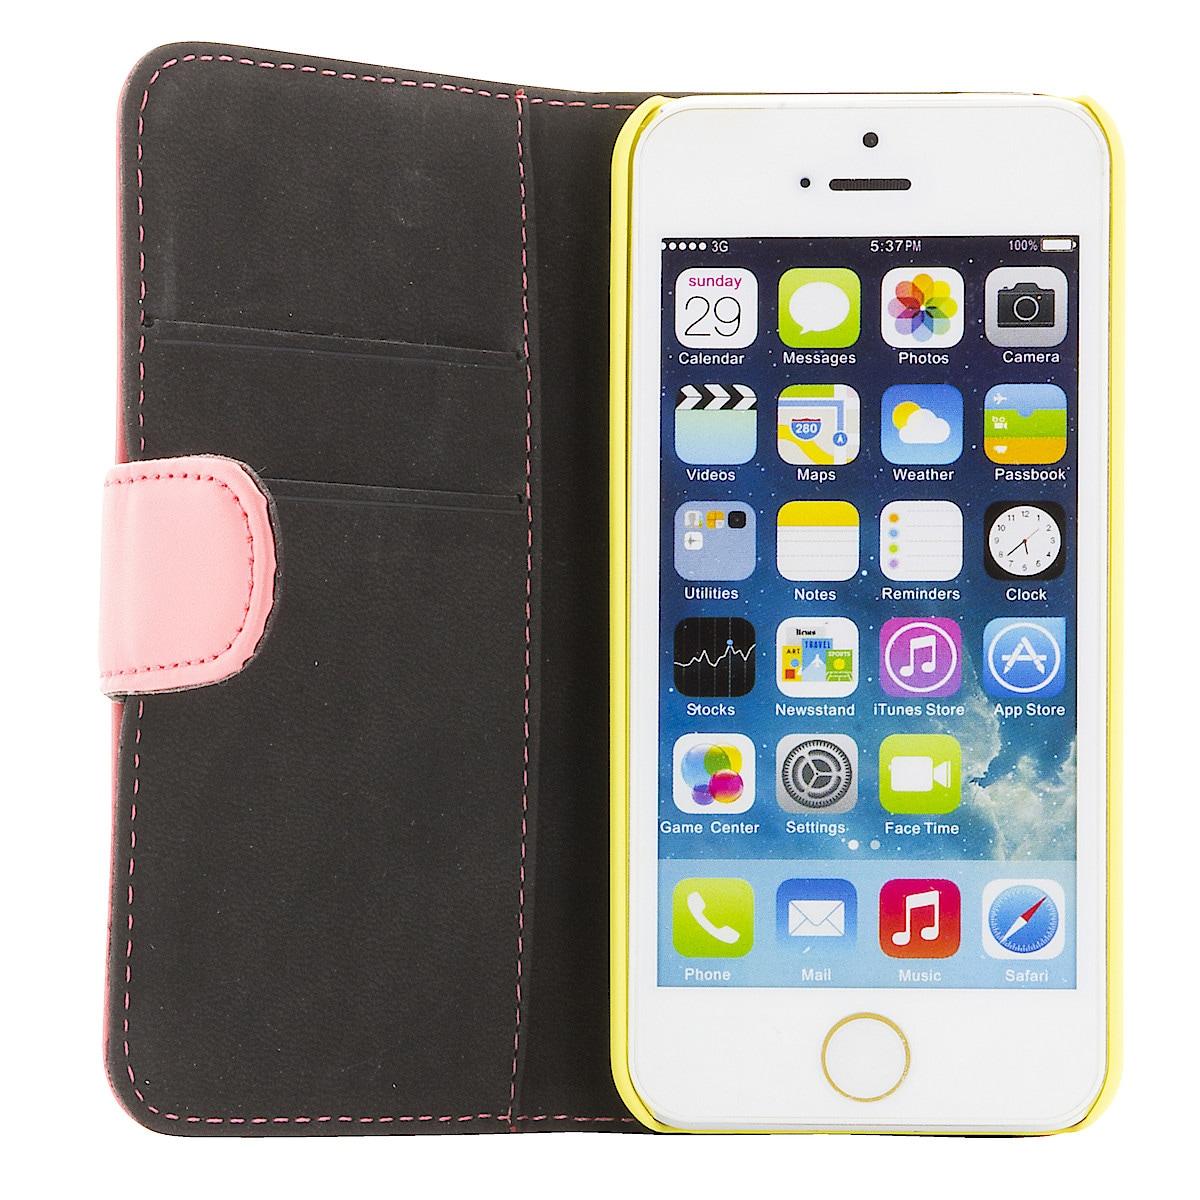 Holdit Wallet Case for iPhone 5/5S/SE